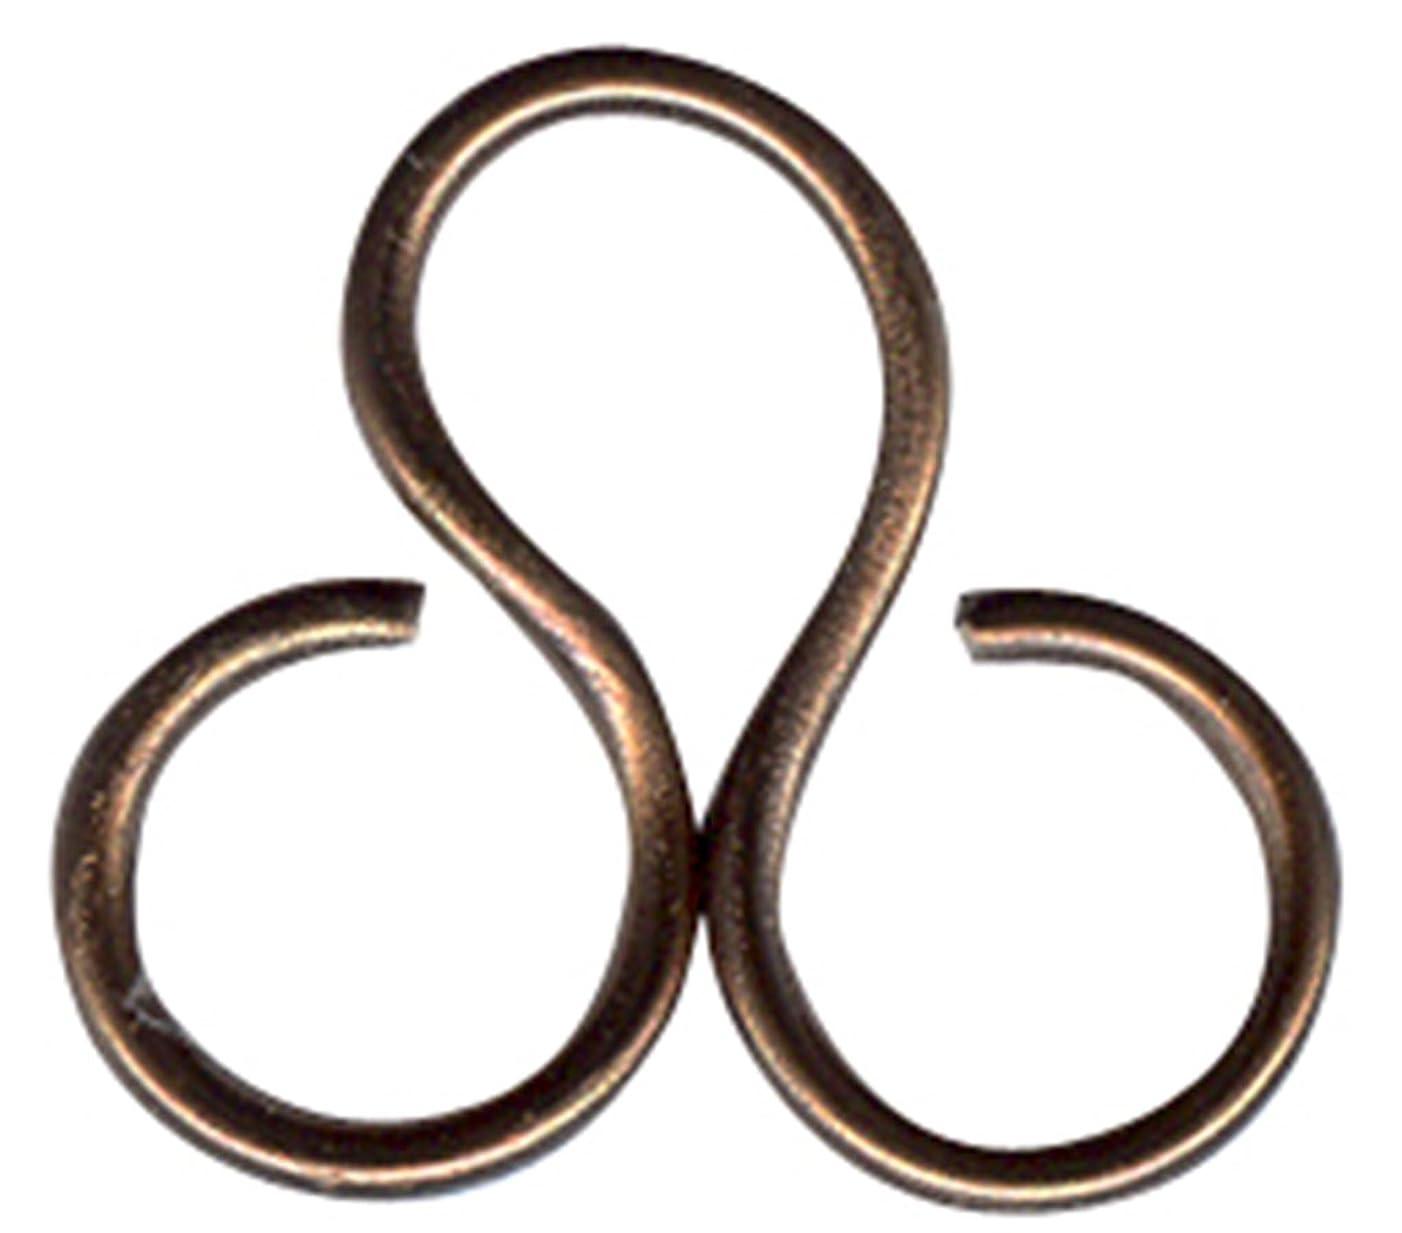 Vaessen Creative Aluminium Wire 2mm 5m Chocolate,